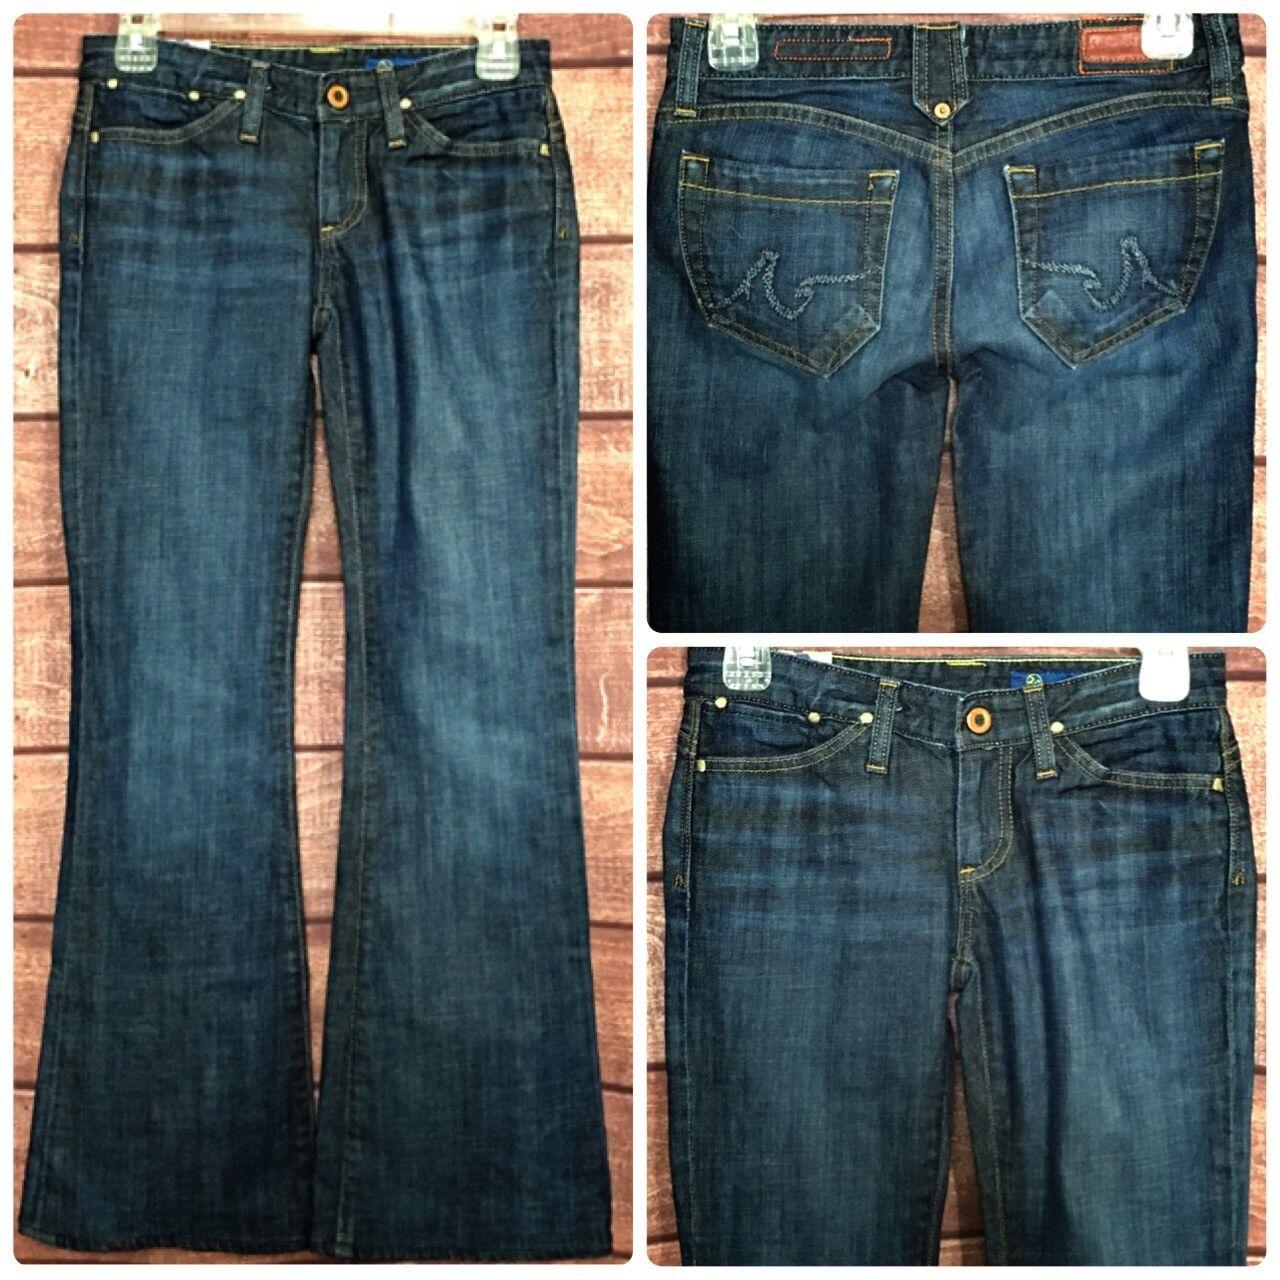 AG Adriano goldscmied Womens Denim Jeans Boot Cut Medium Wash Size 28x29